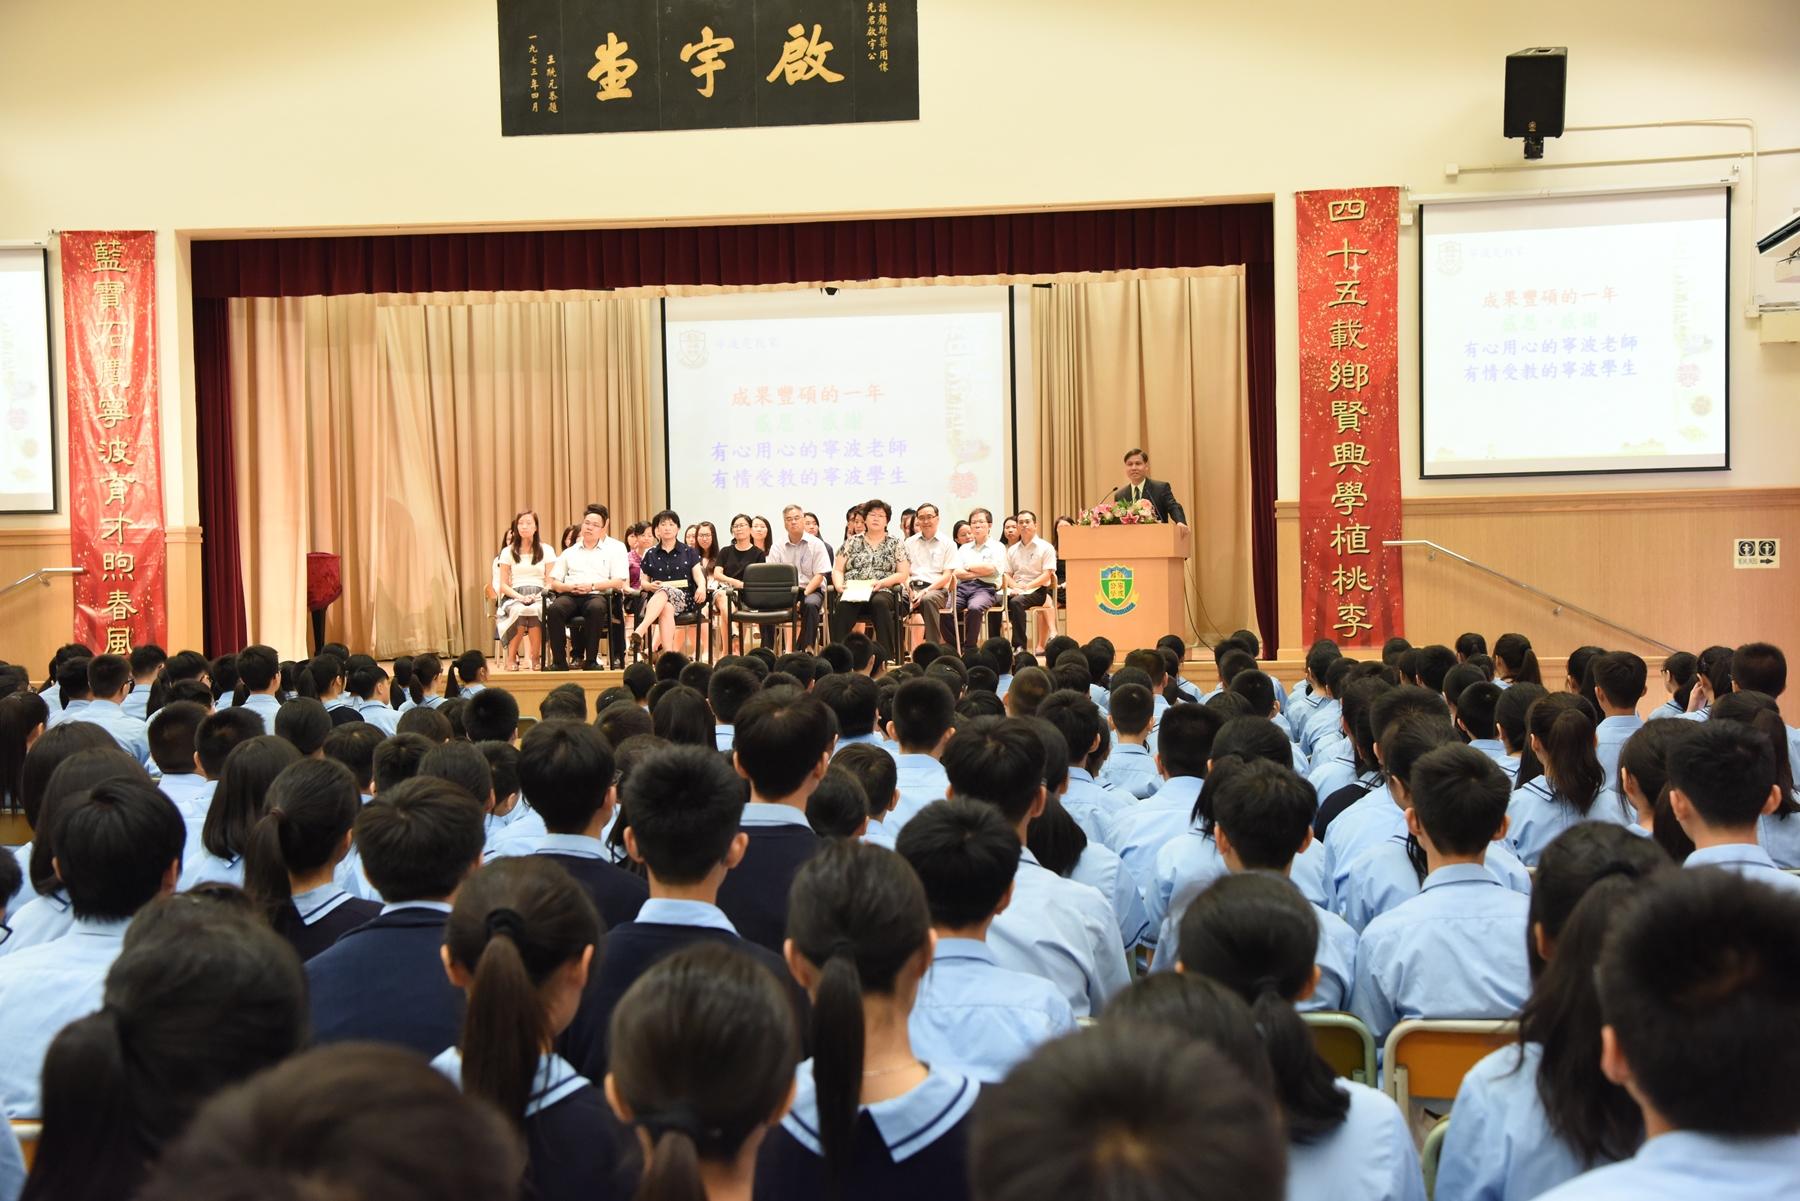 http://www.npc.edu.hk/sites/default/files/dsc_1072.jpg